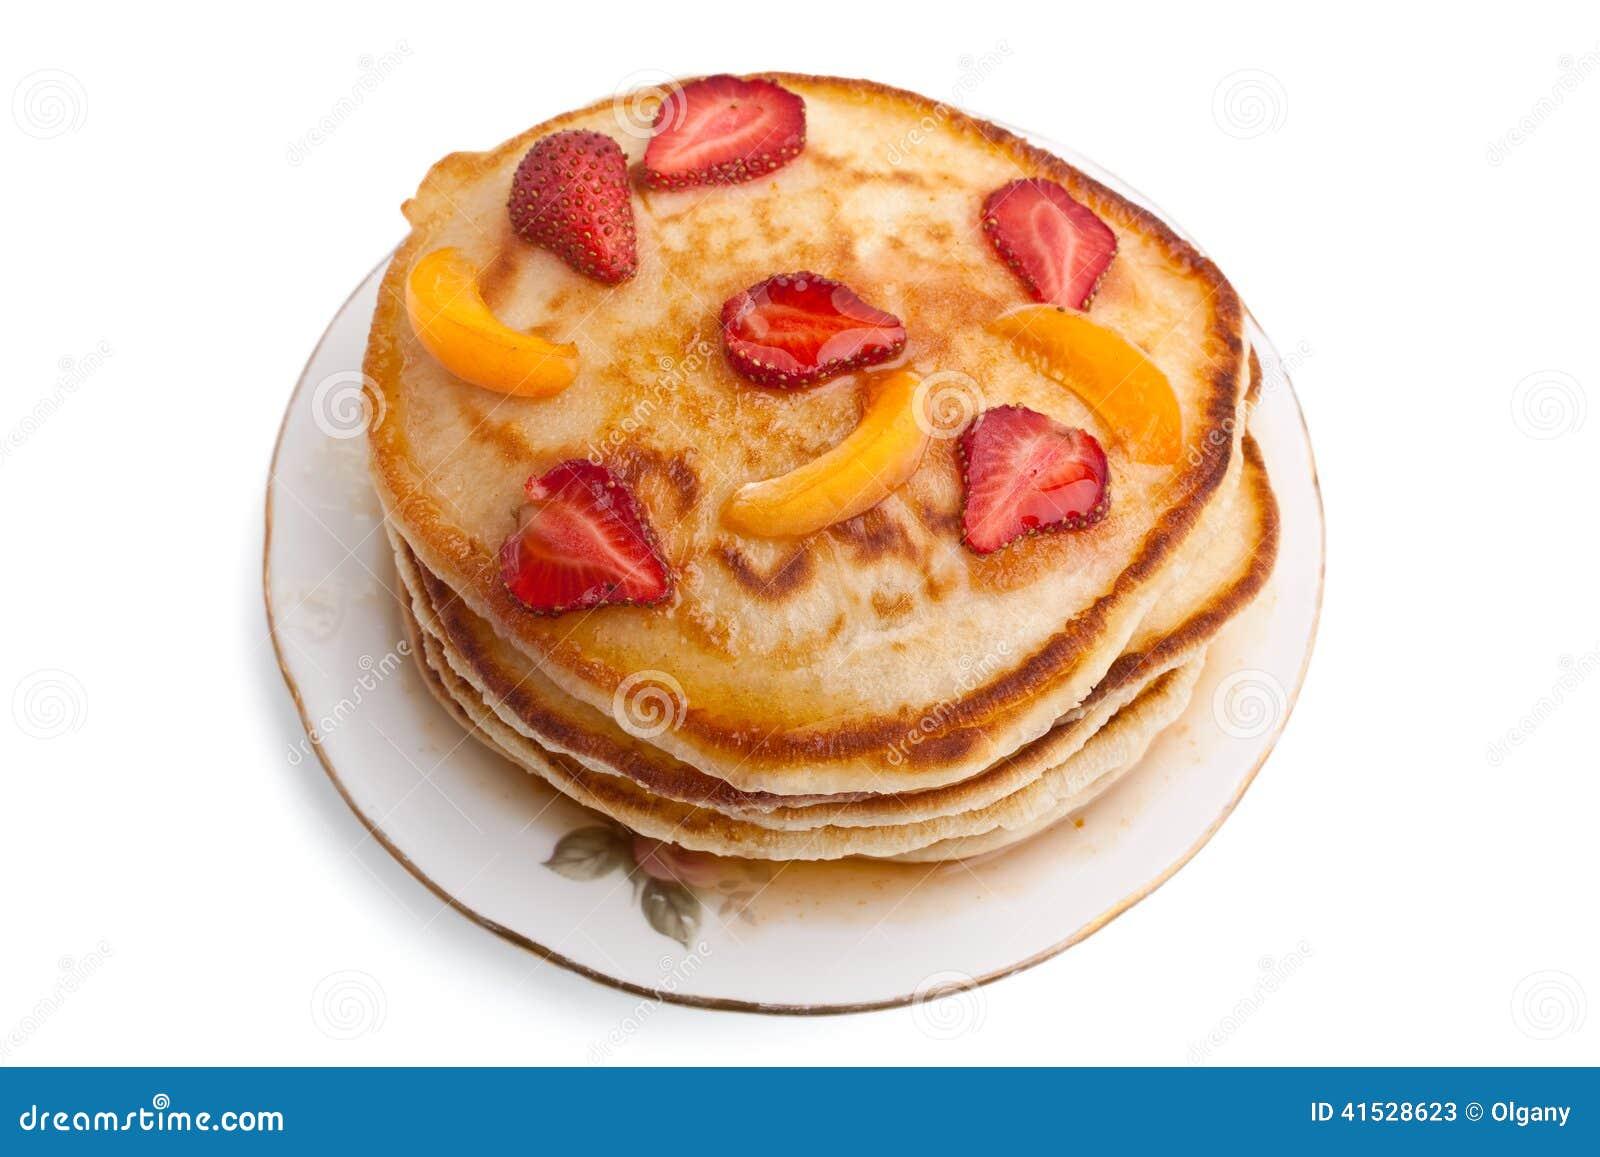 Sugar Syrup Glaze For Fruit Cake